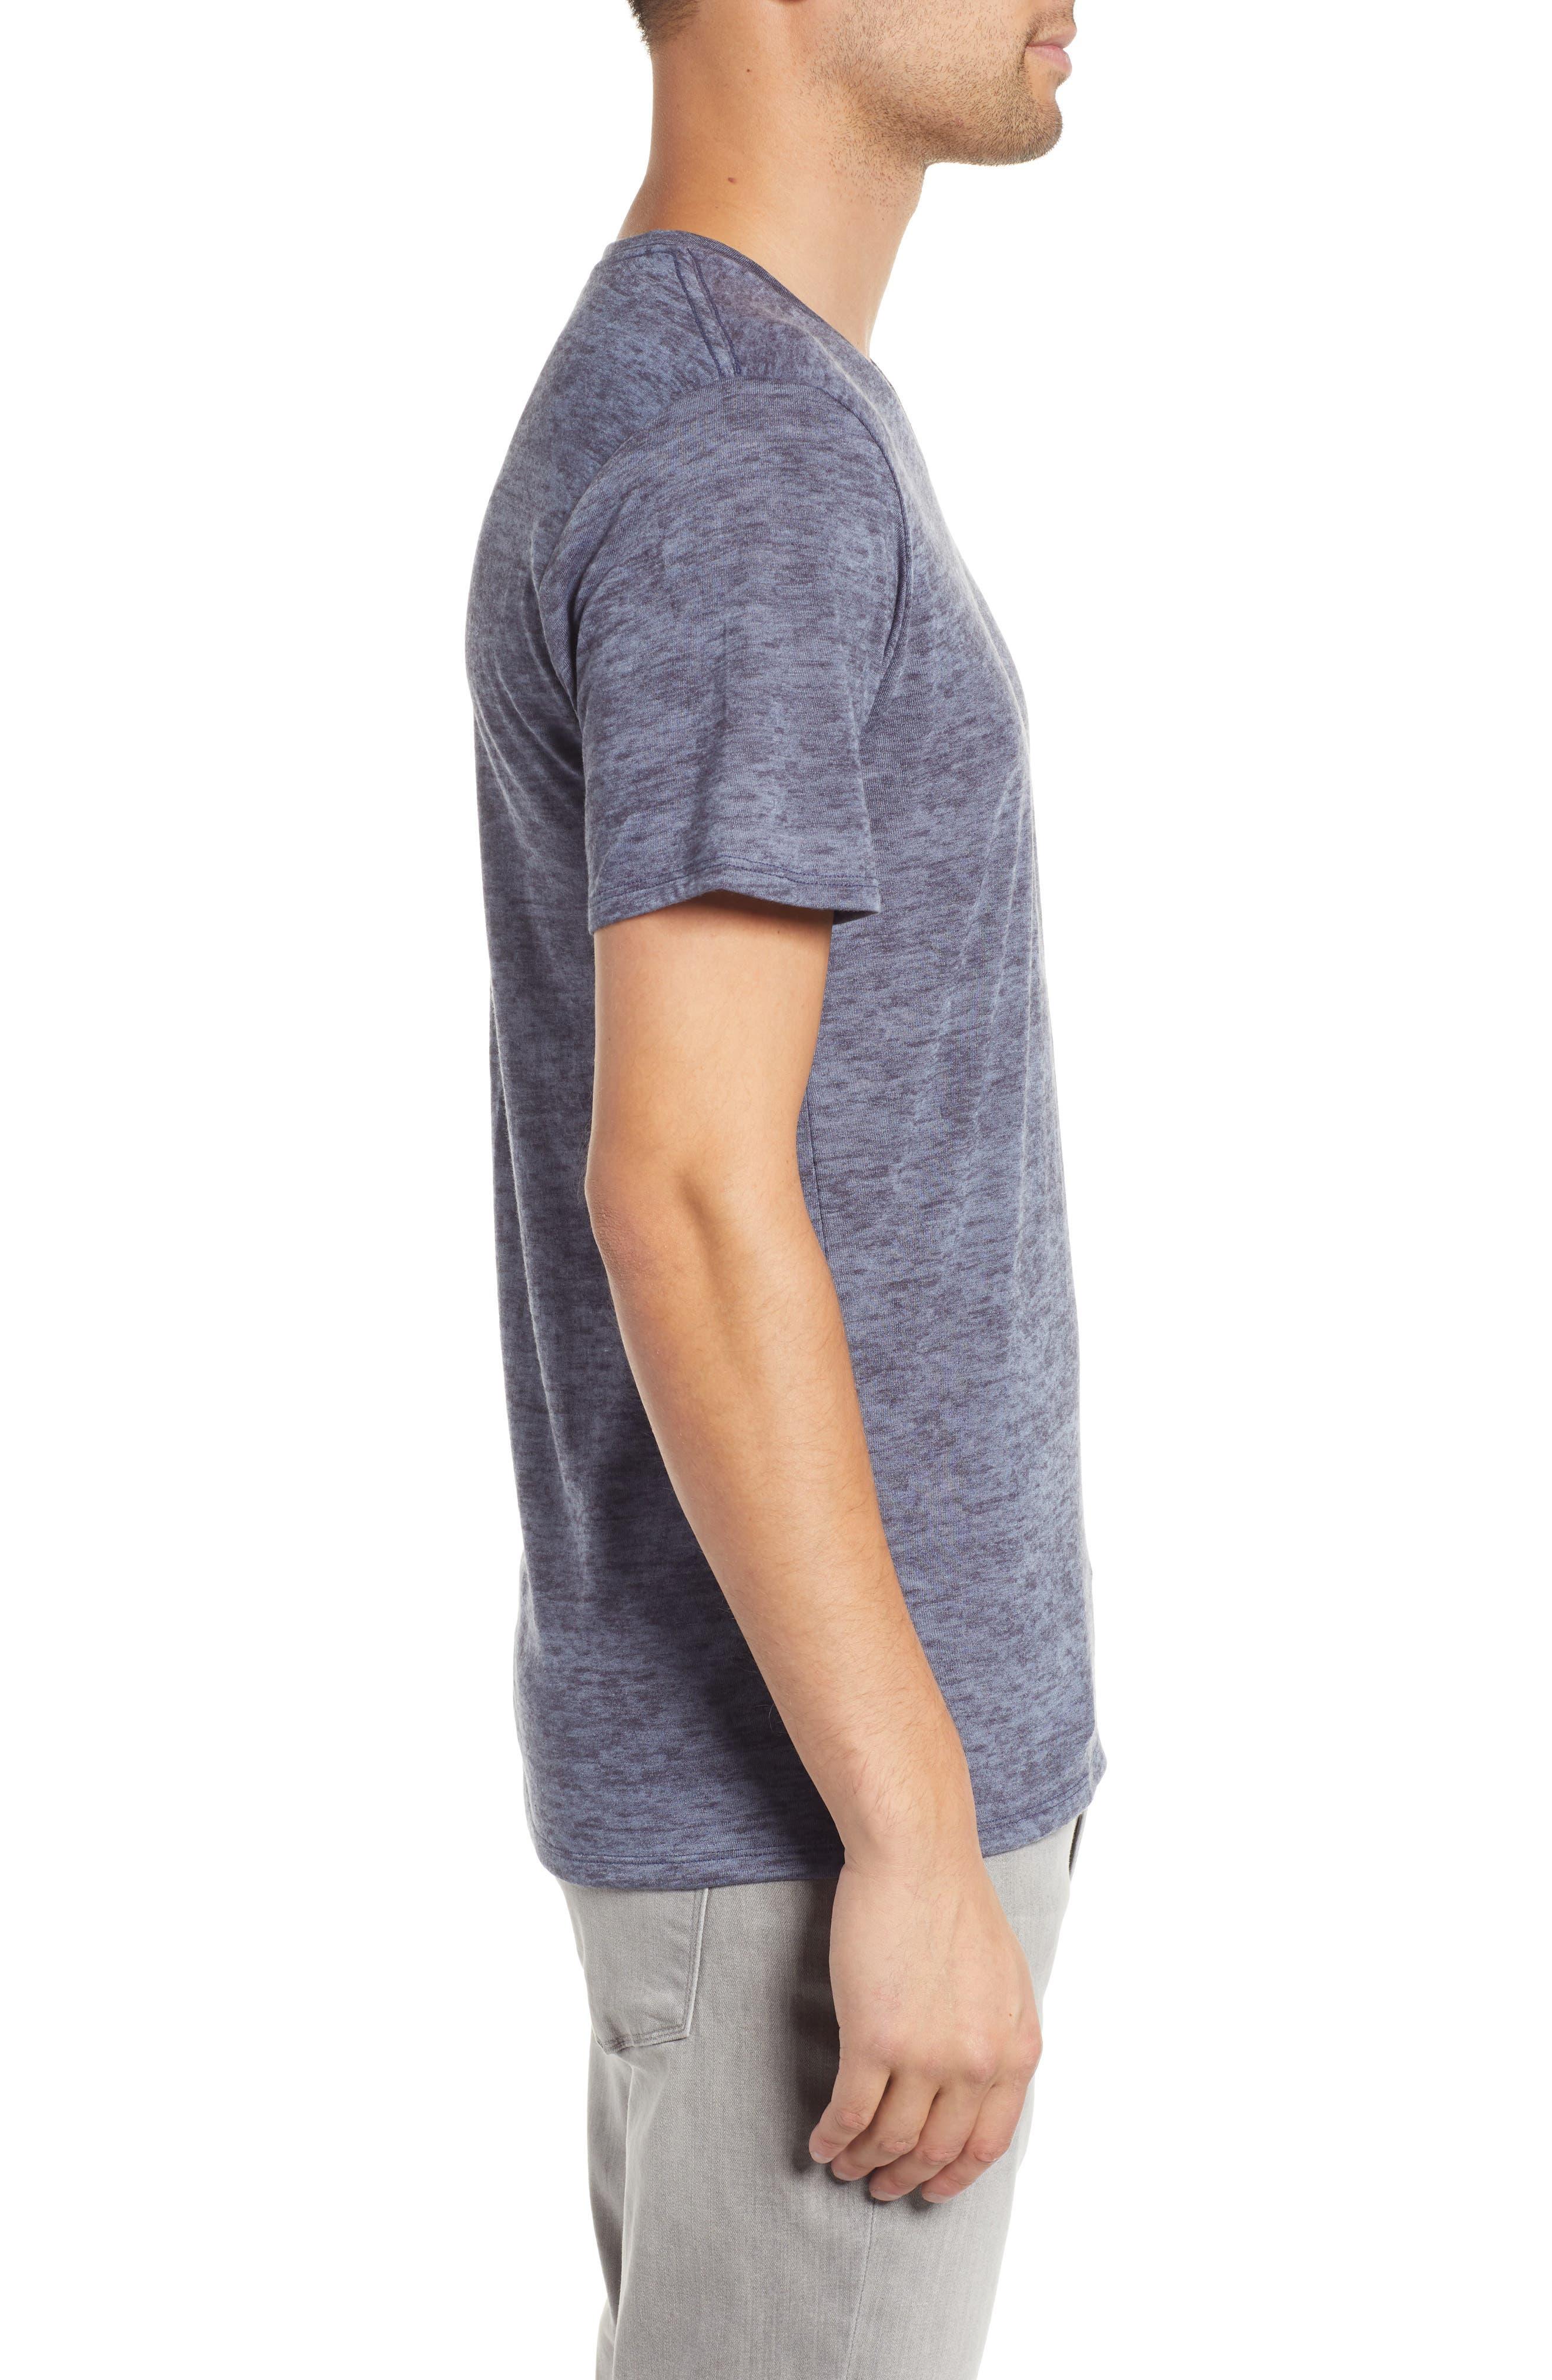 THE RAIL, Burnout V-Neck T-Shirt, Alternate thumbnail 3, color, BLUE STONEWASH - NAVY BURNOUT